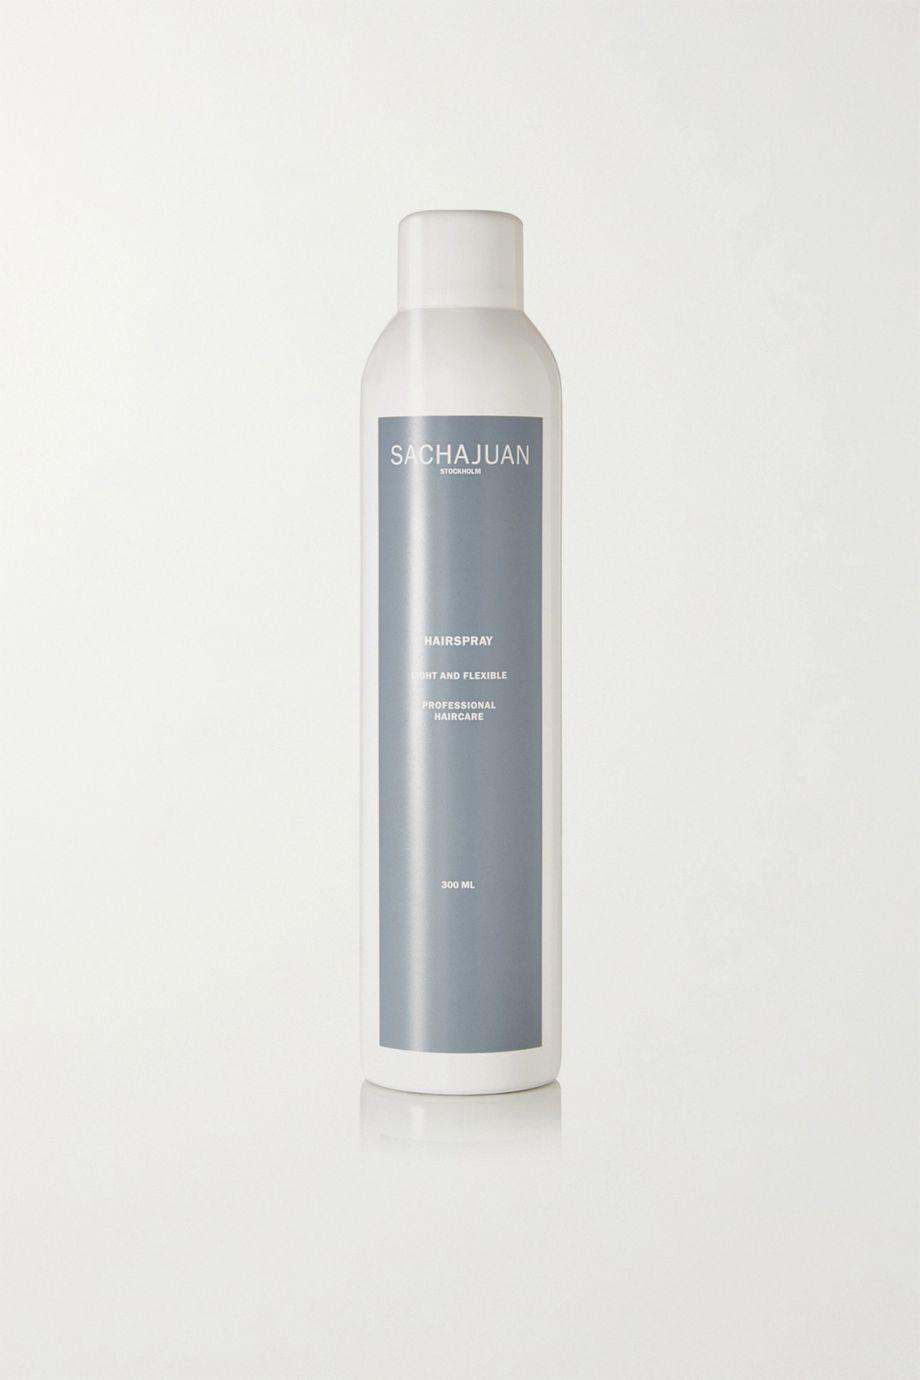 SACHAJUAN Hairspray – Light & Flexible, 300 ml – Haarspray